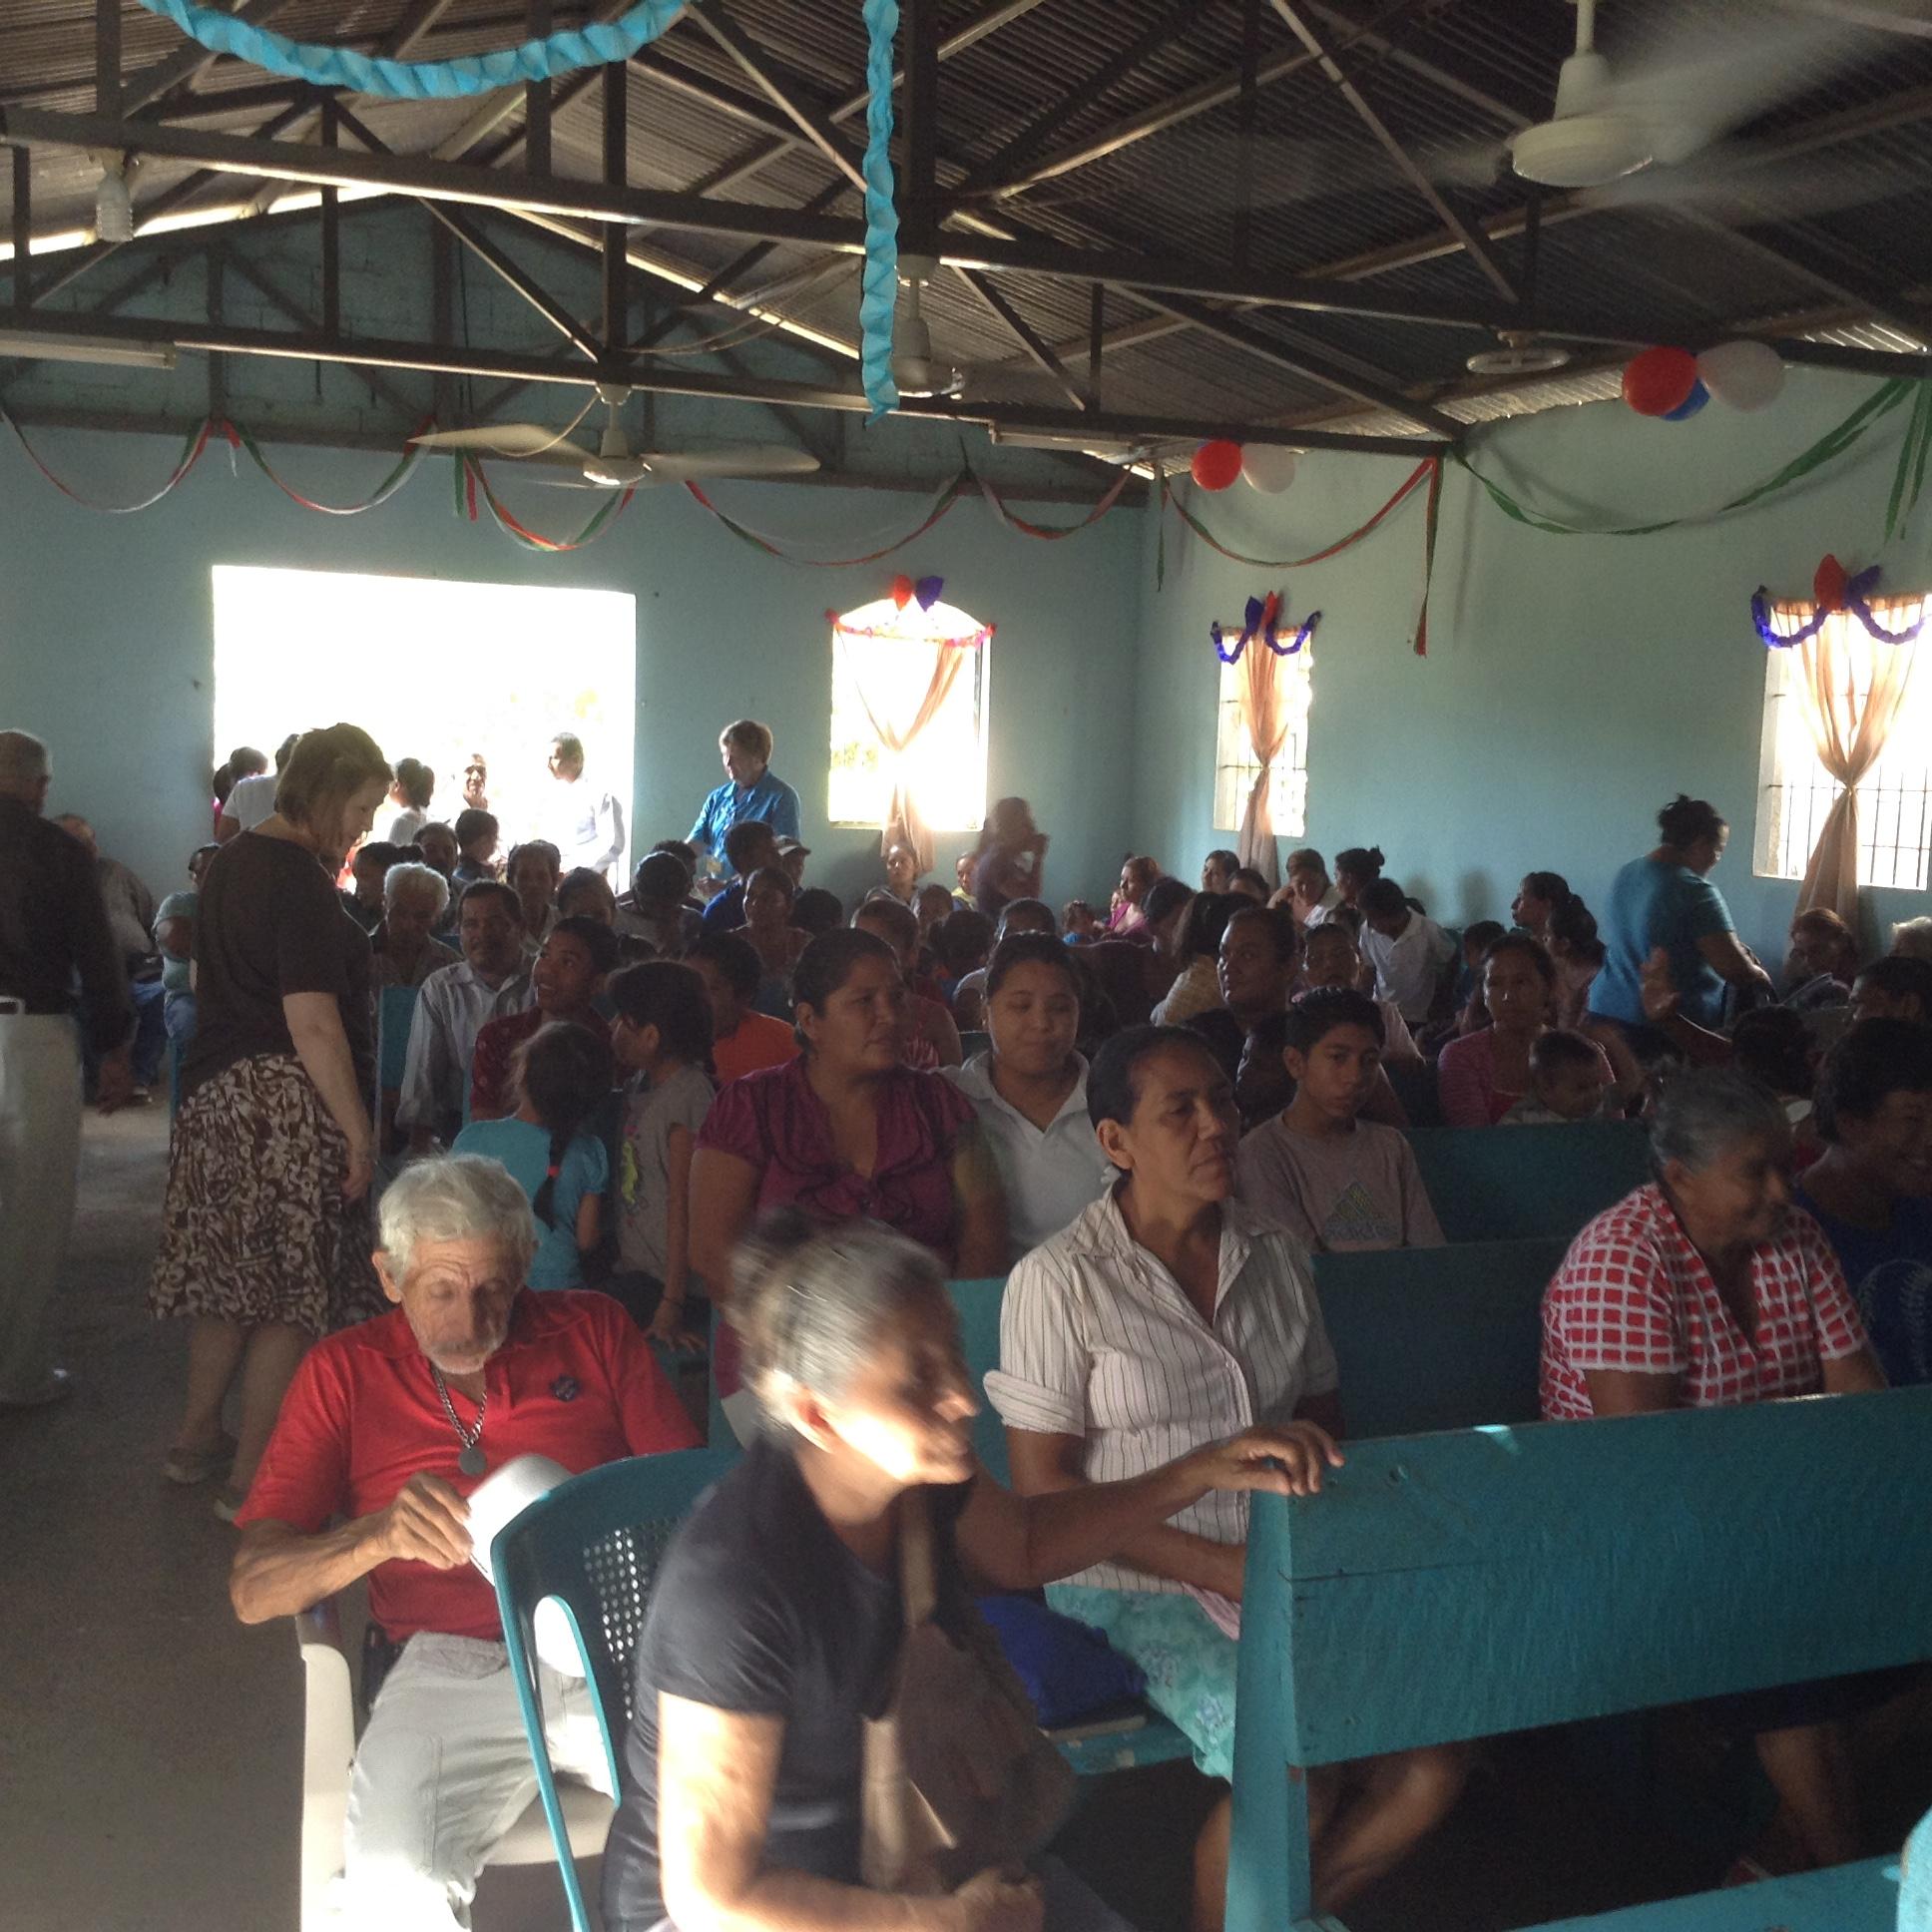 Church attendees